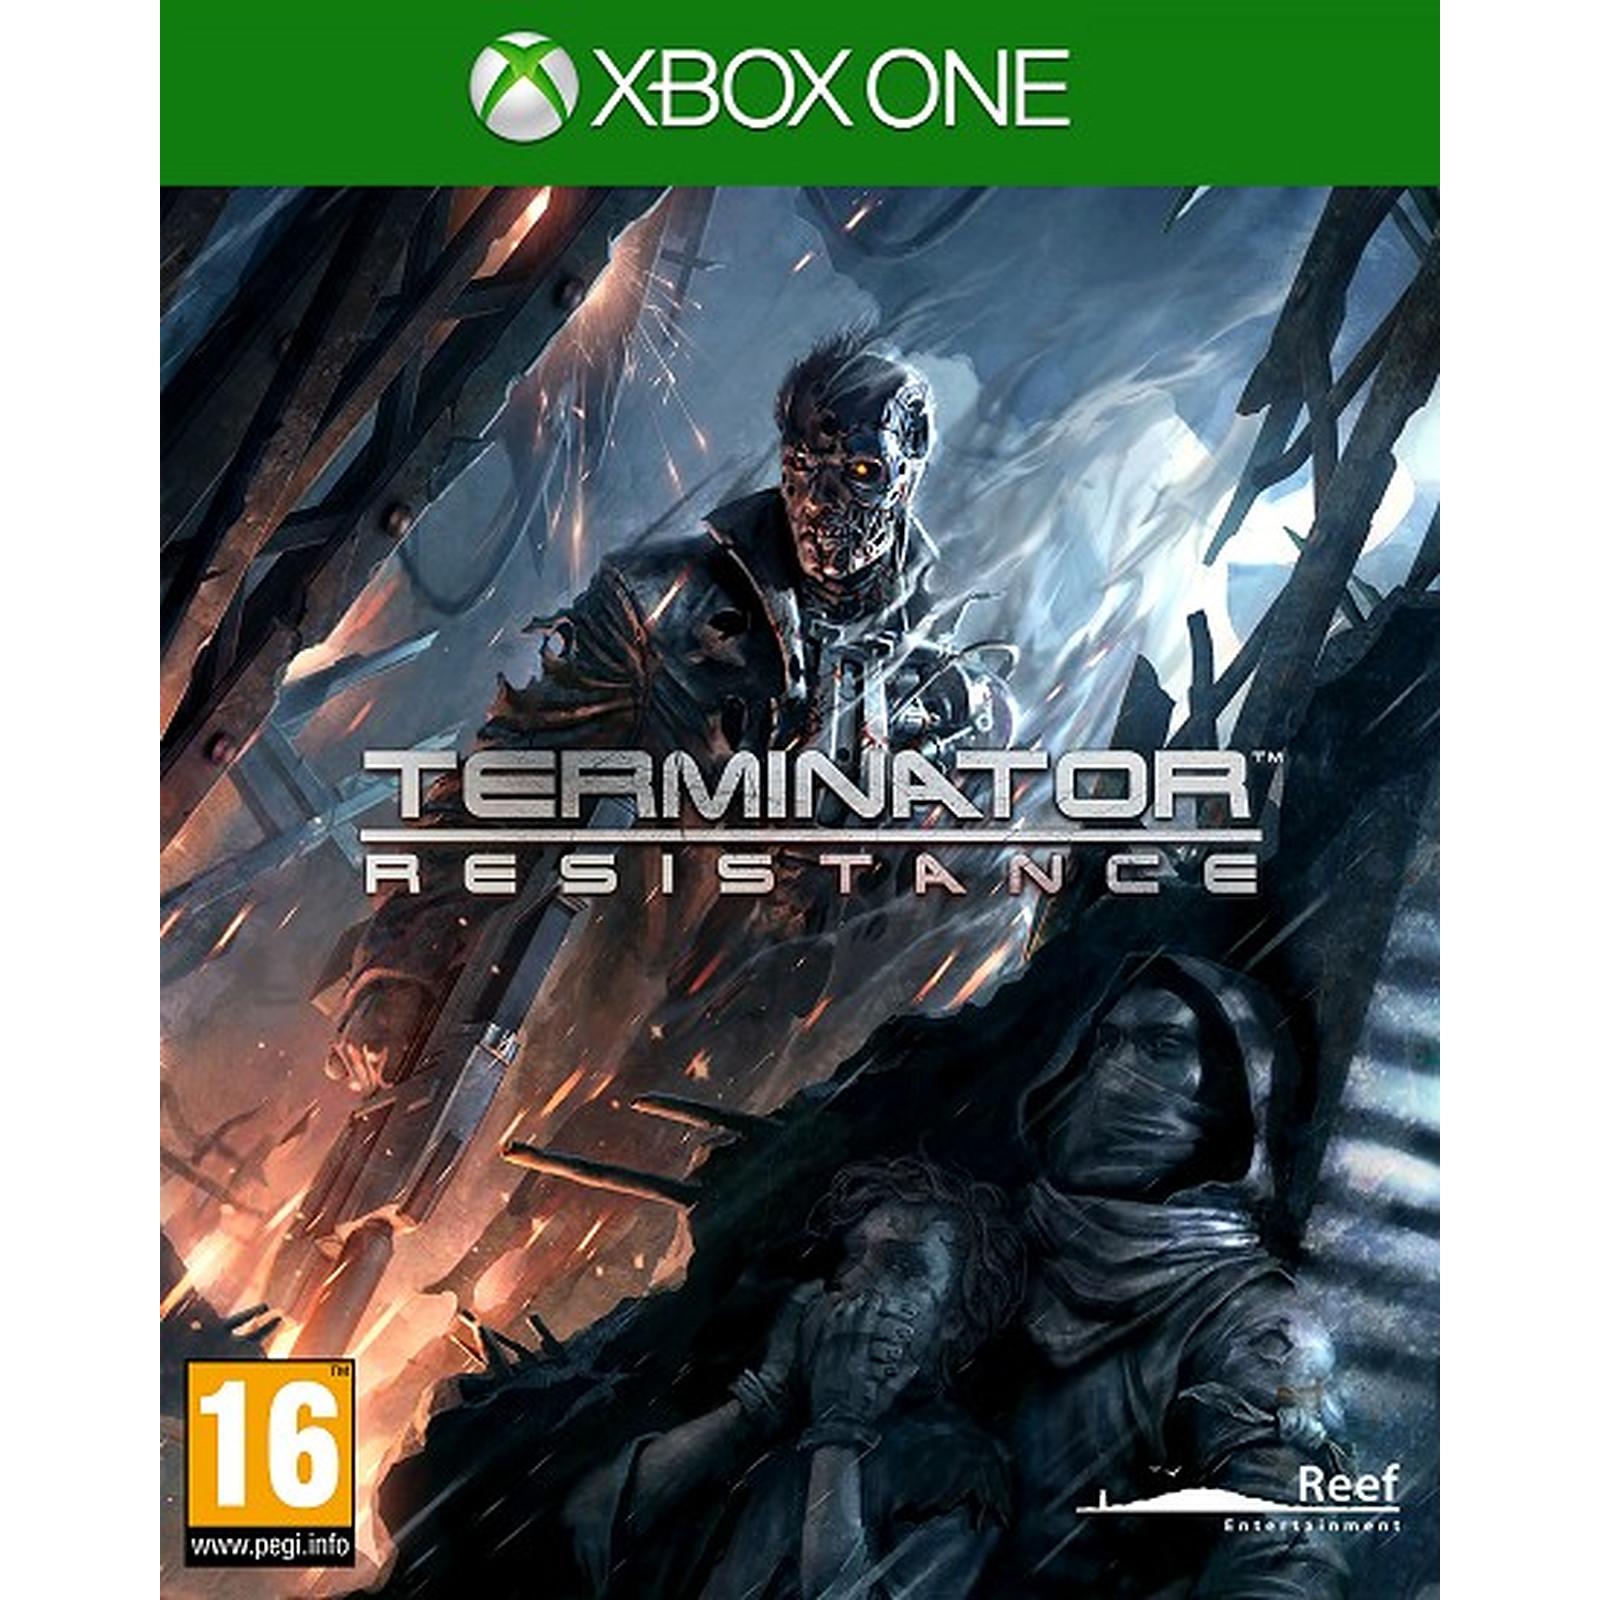 Terminator Resistance (XBOX ONE)